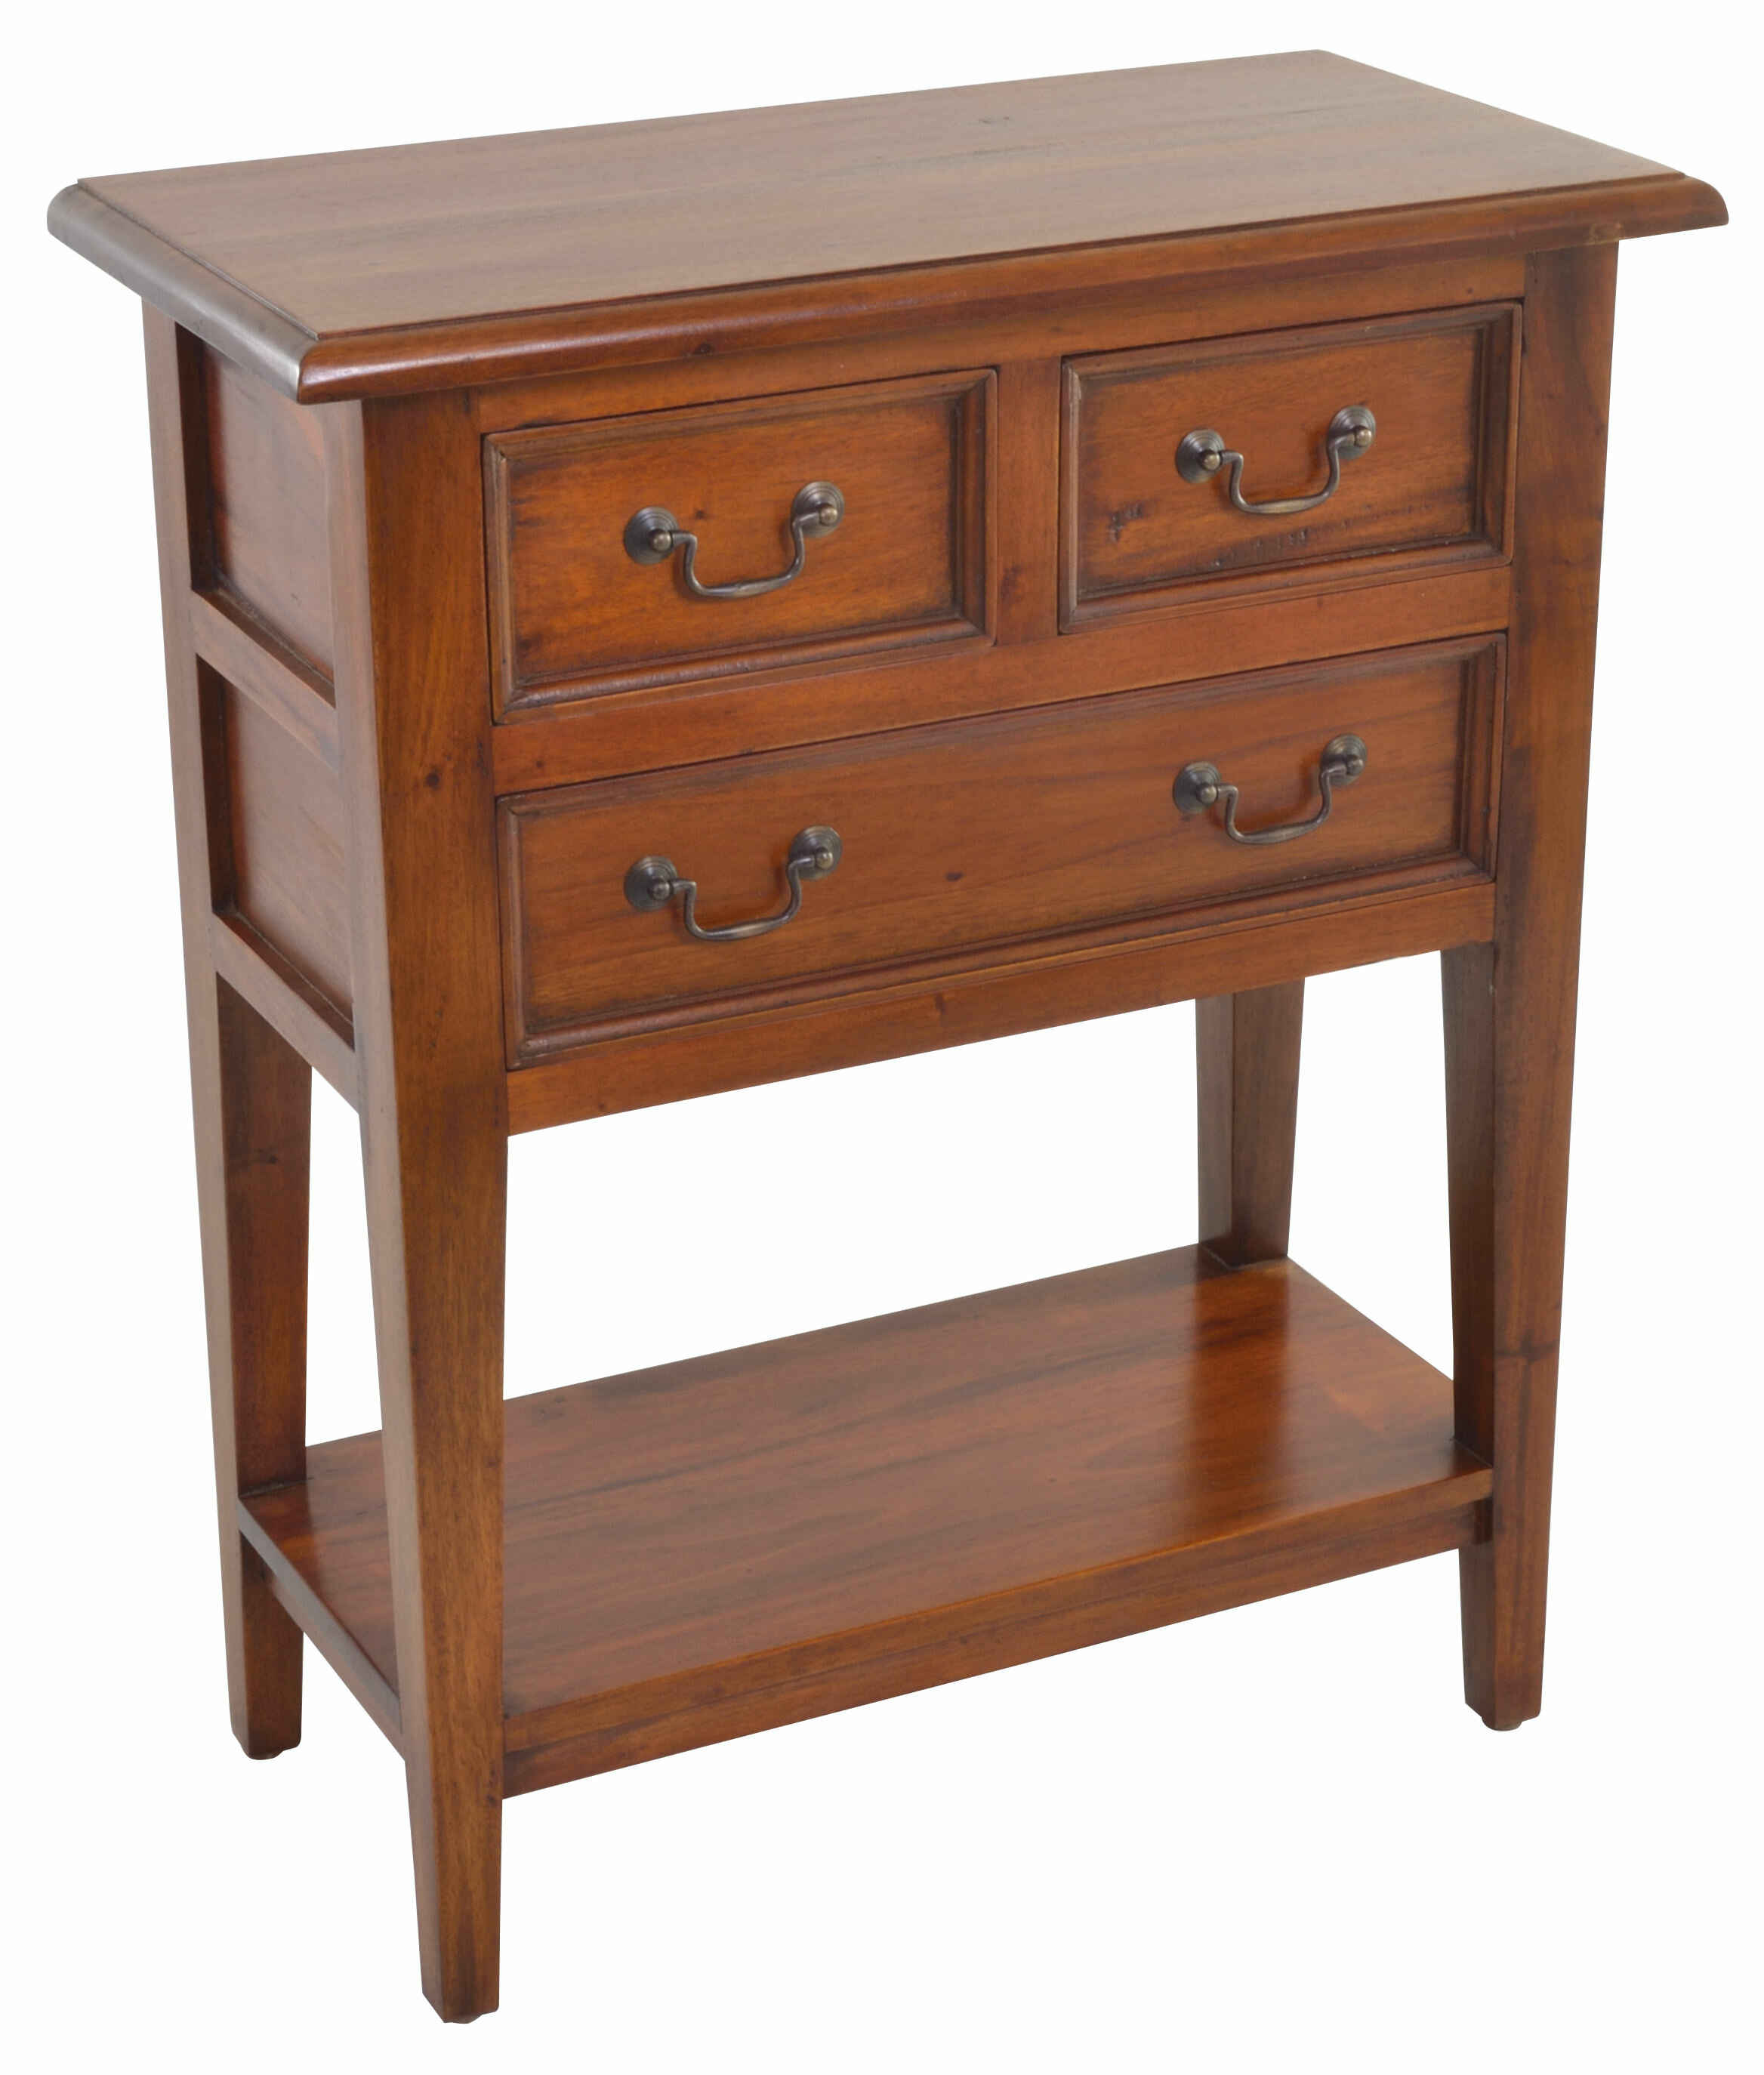 buy online 6c17f 5ea2a Adlington Multi-Tiered Telephone Table